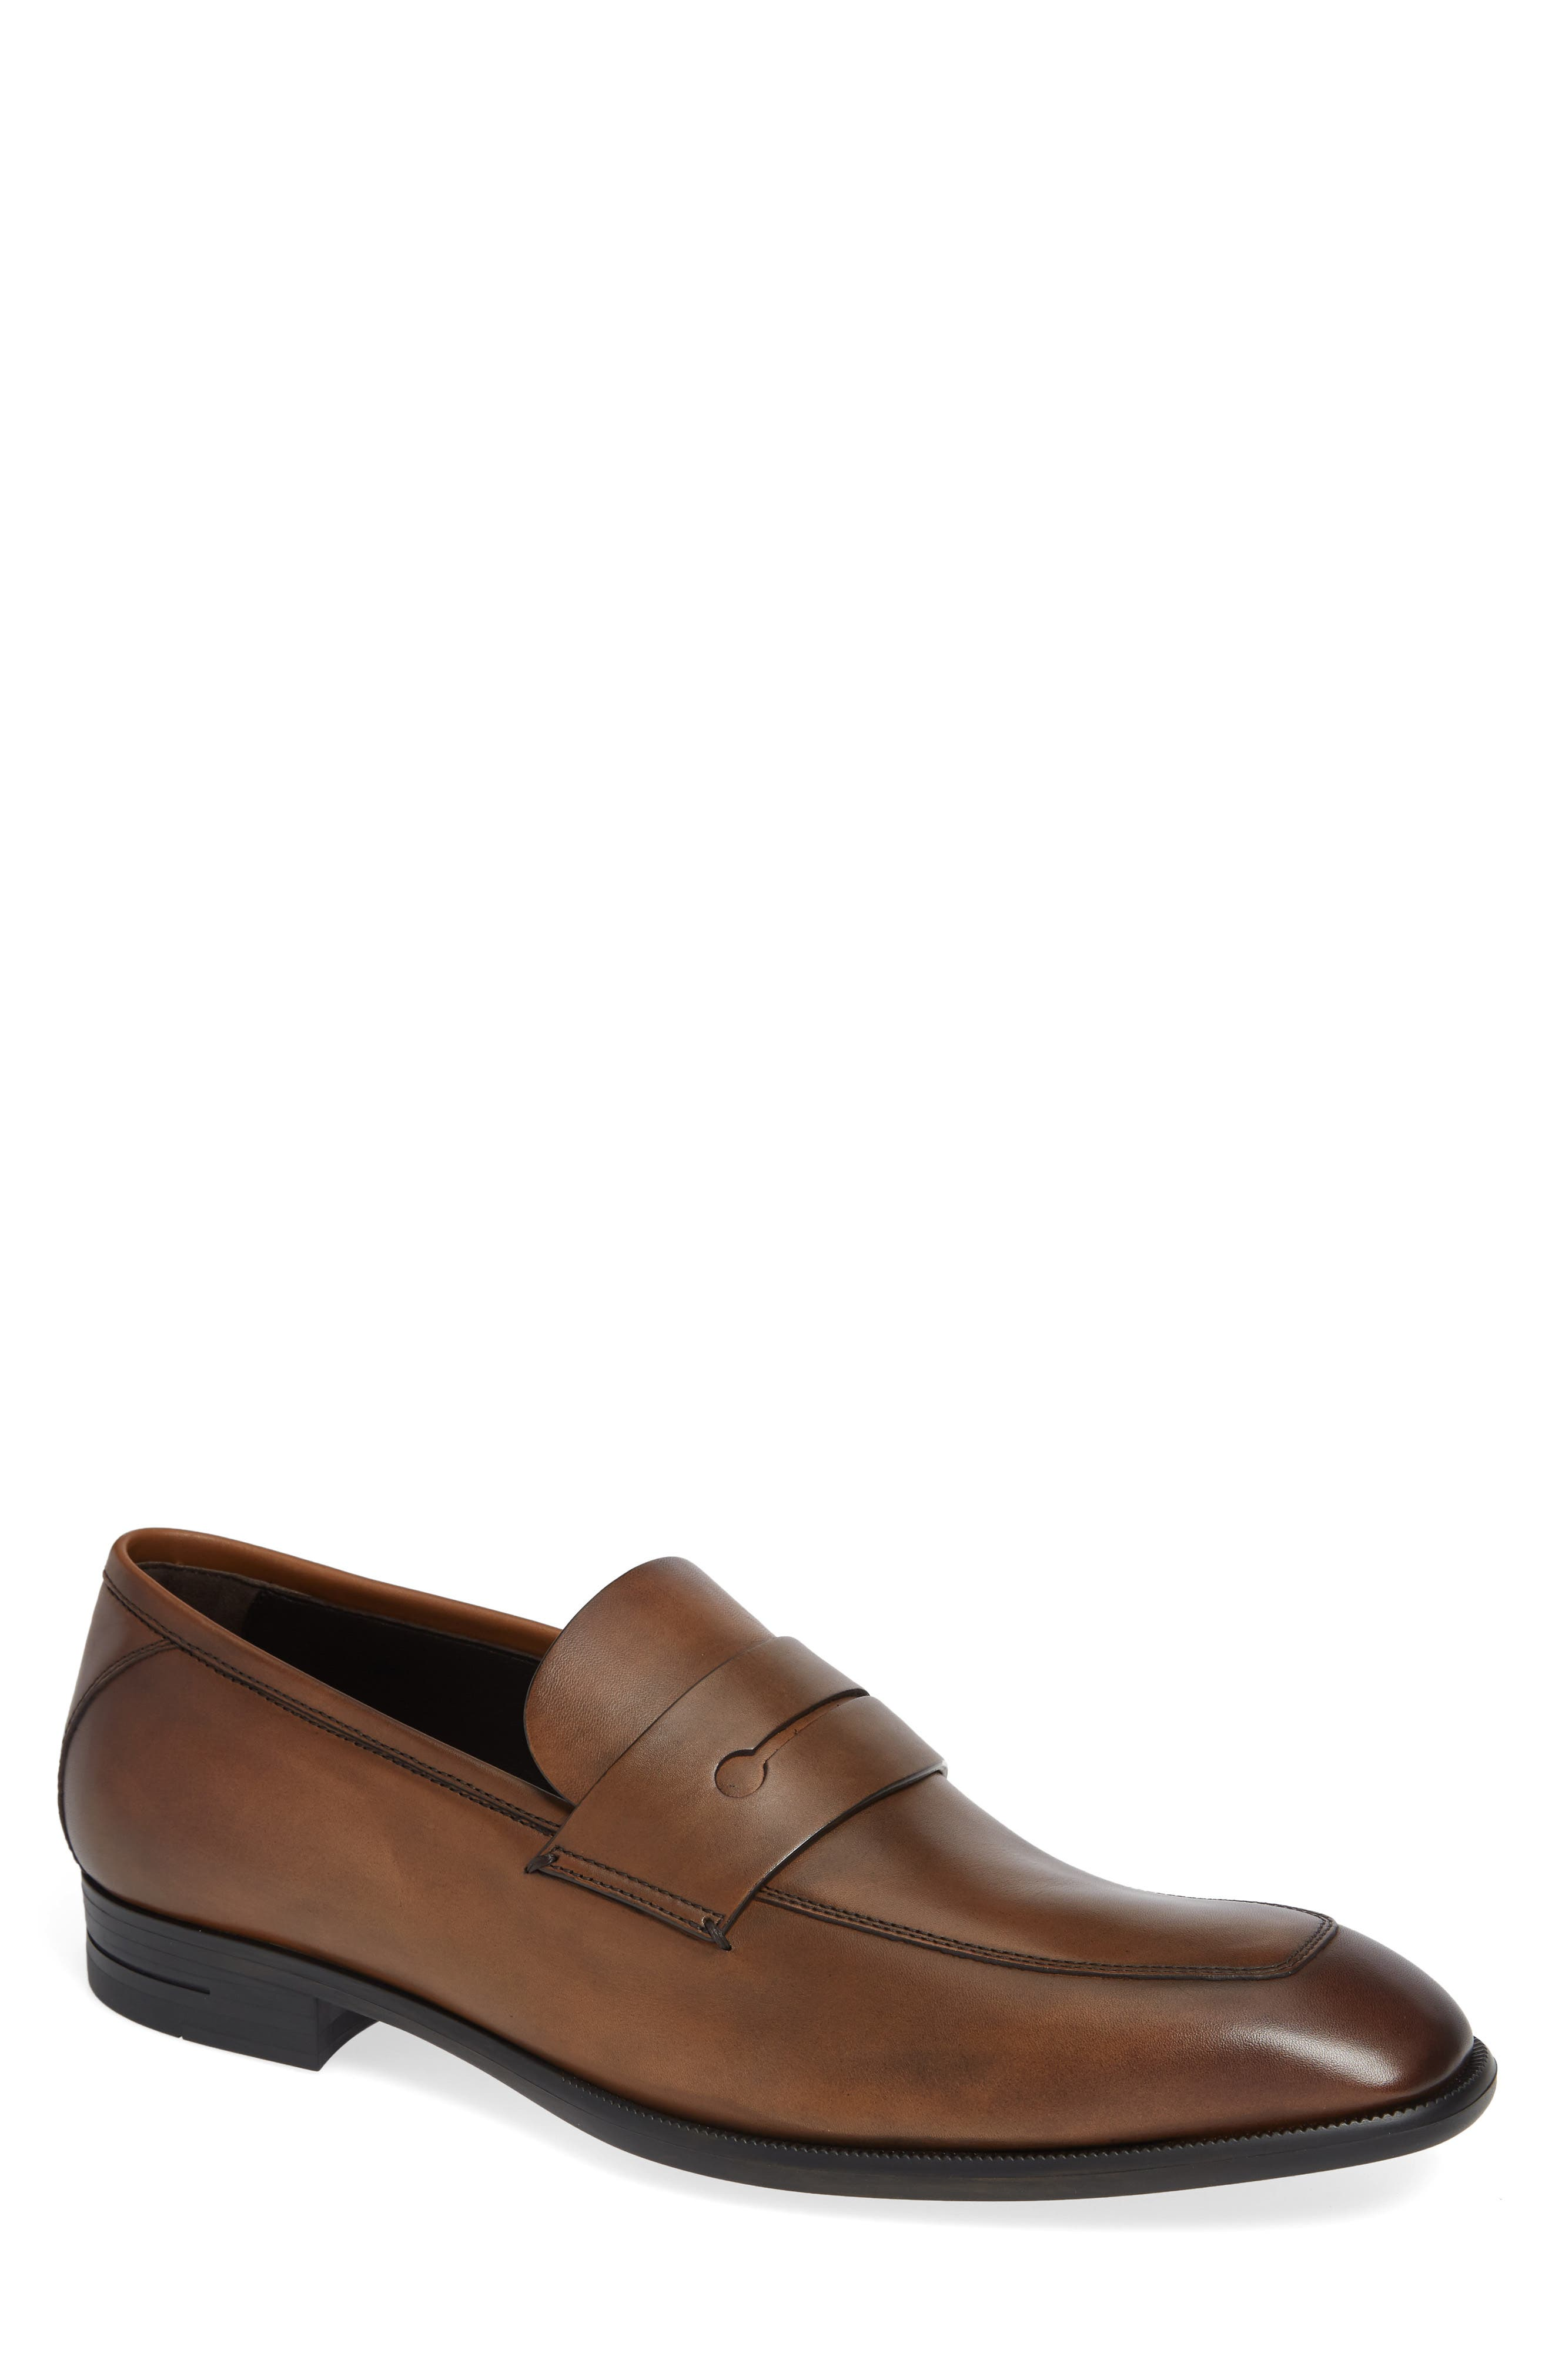 Men's Ermenegildo Zegna Shoes | Nordstrom